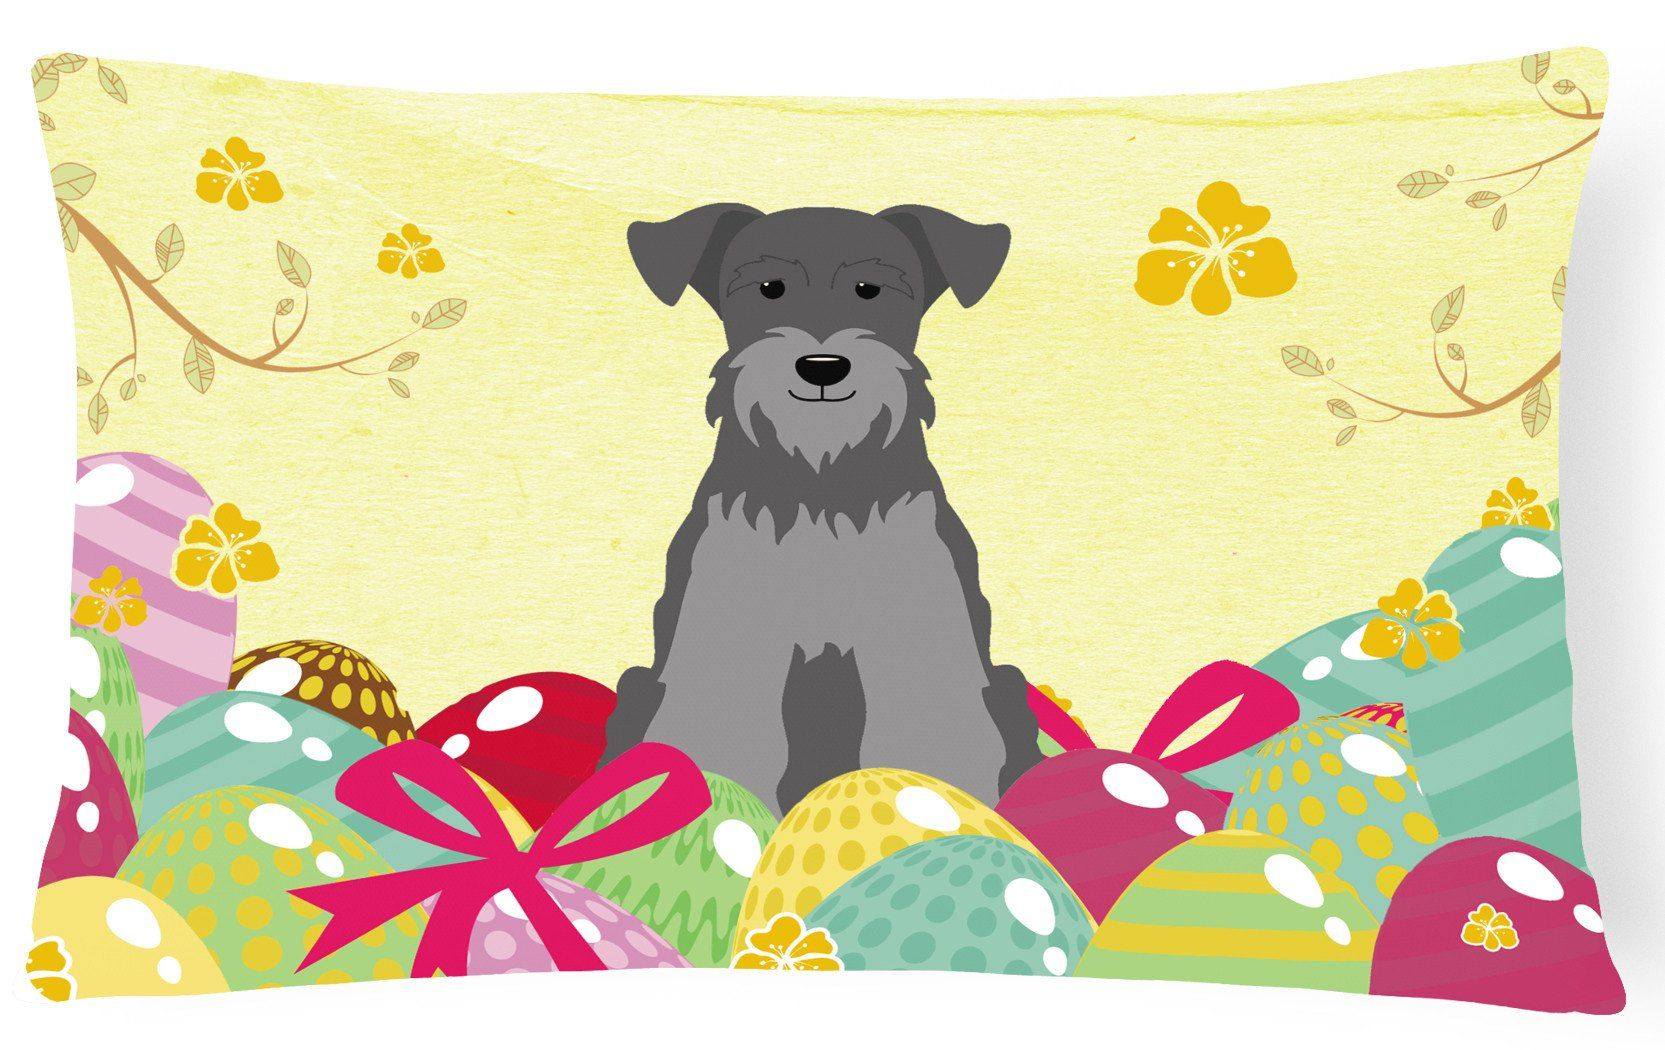 Easter Eggs Miniature Schanuzer Black Silver Canvas Fabric Decorative Pillow BB6052PW1216